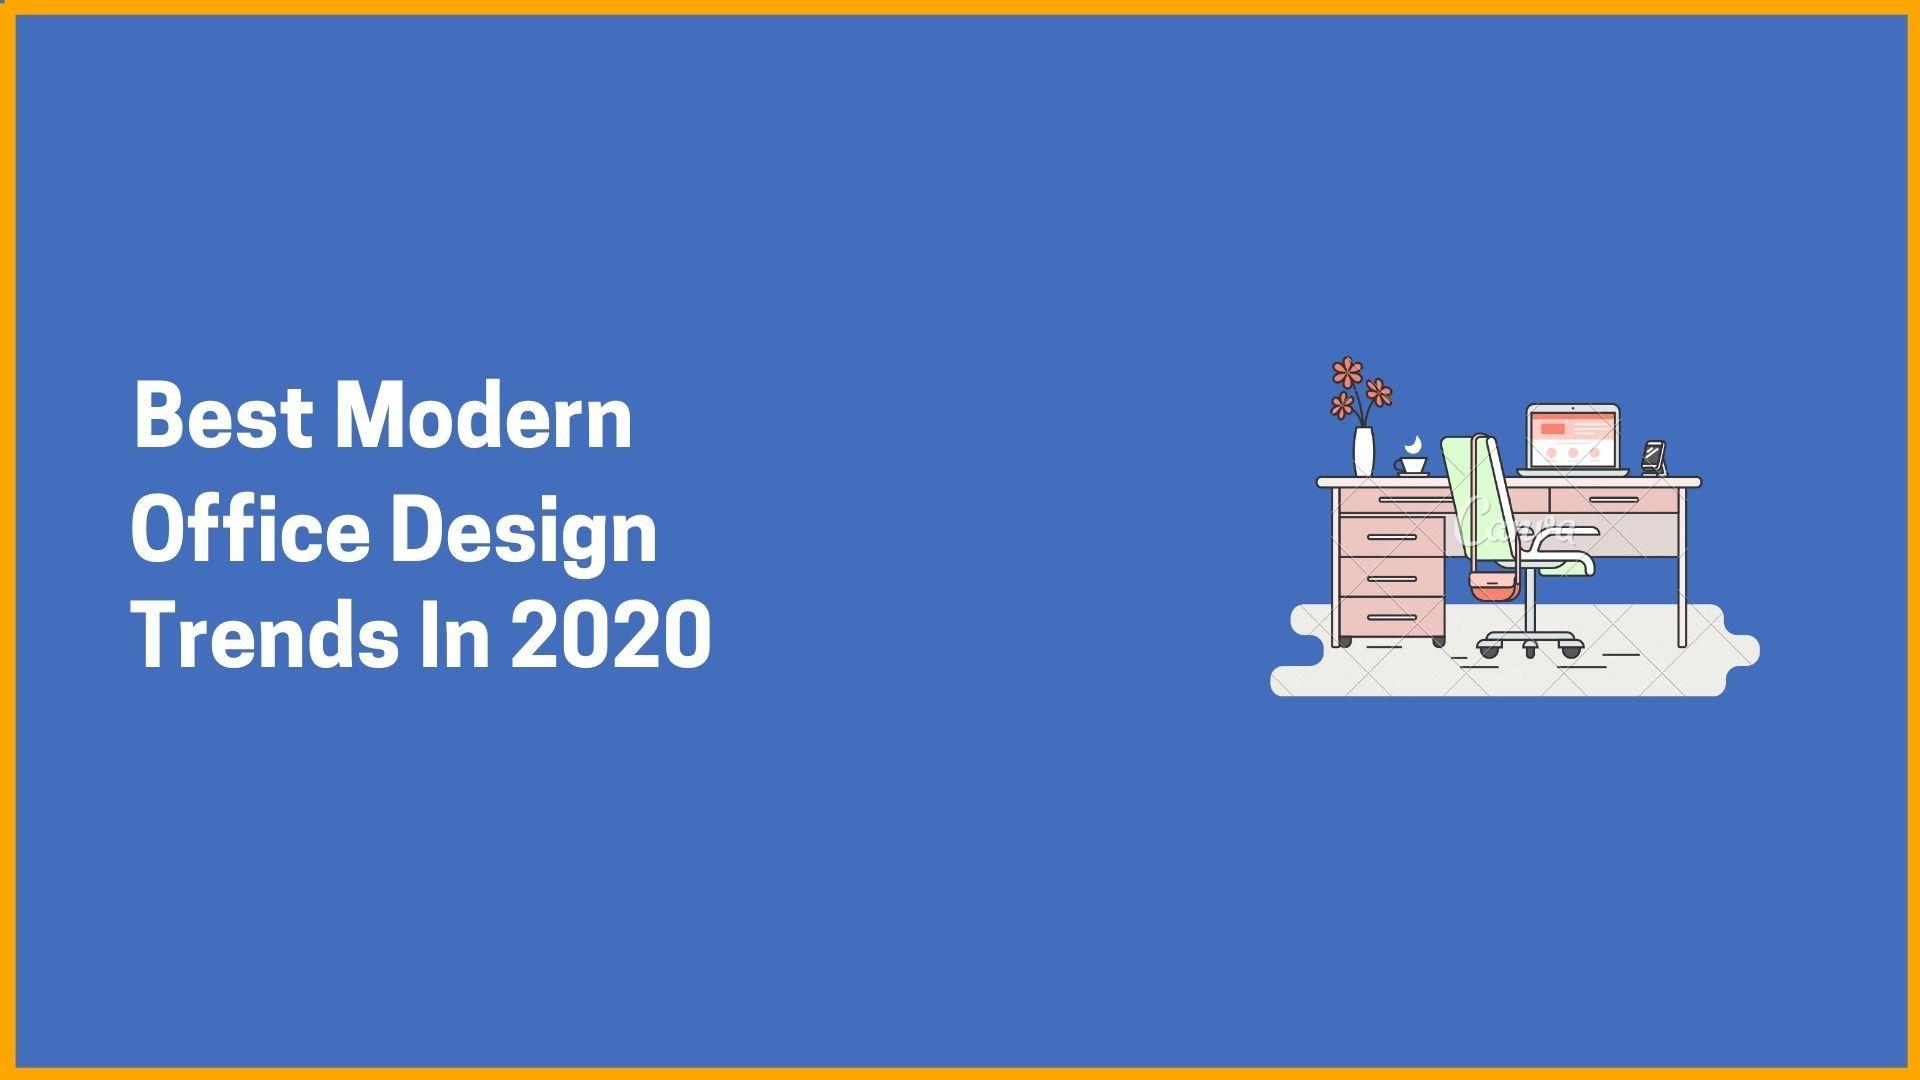 Best Modern Office Design Trends In 2020